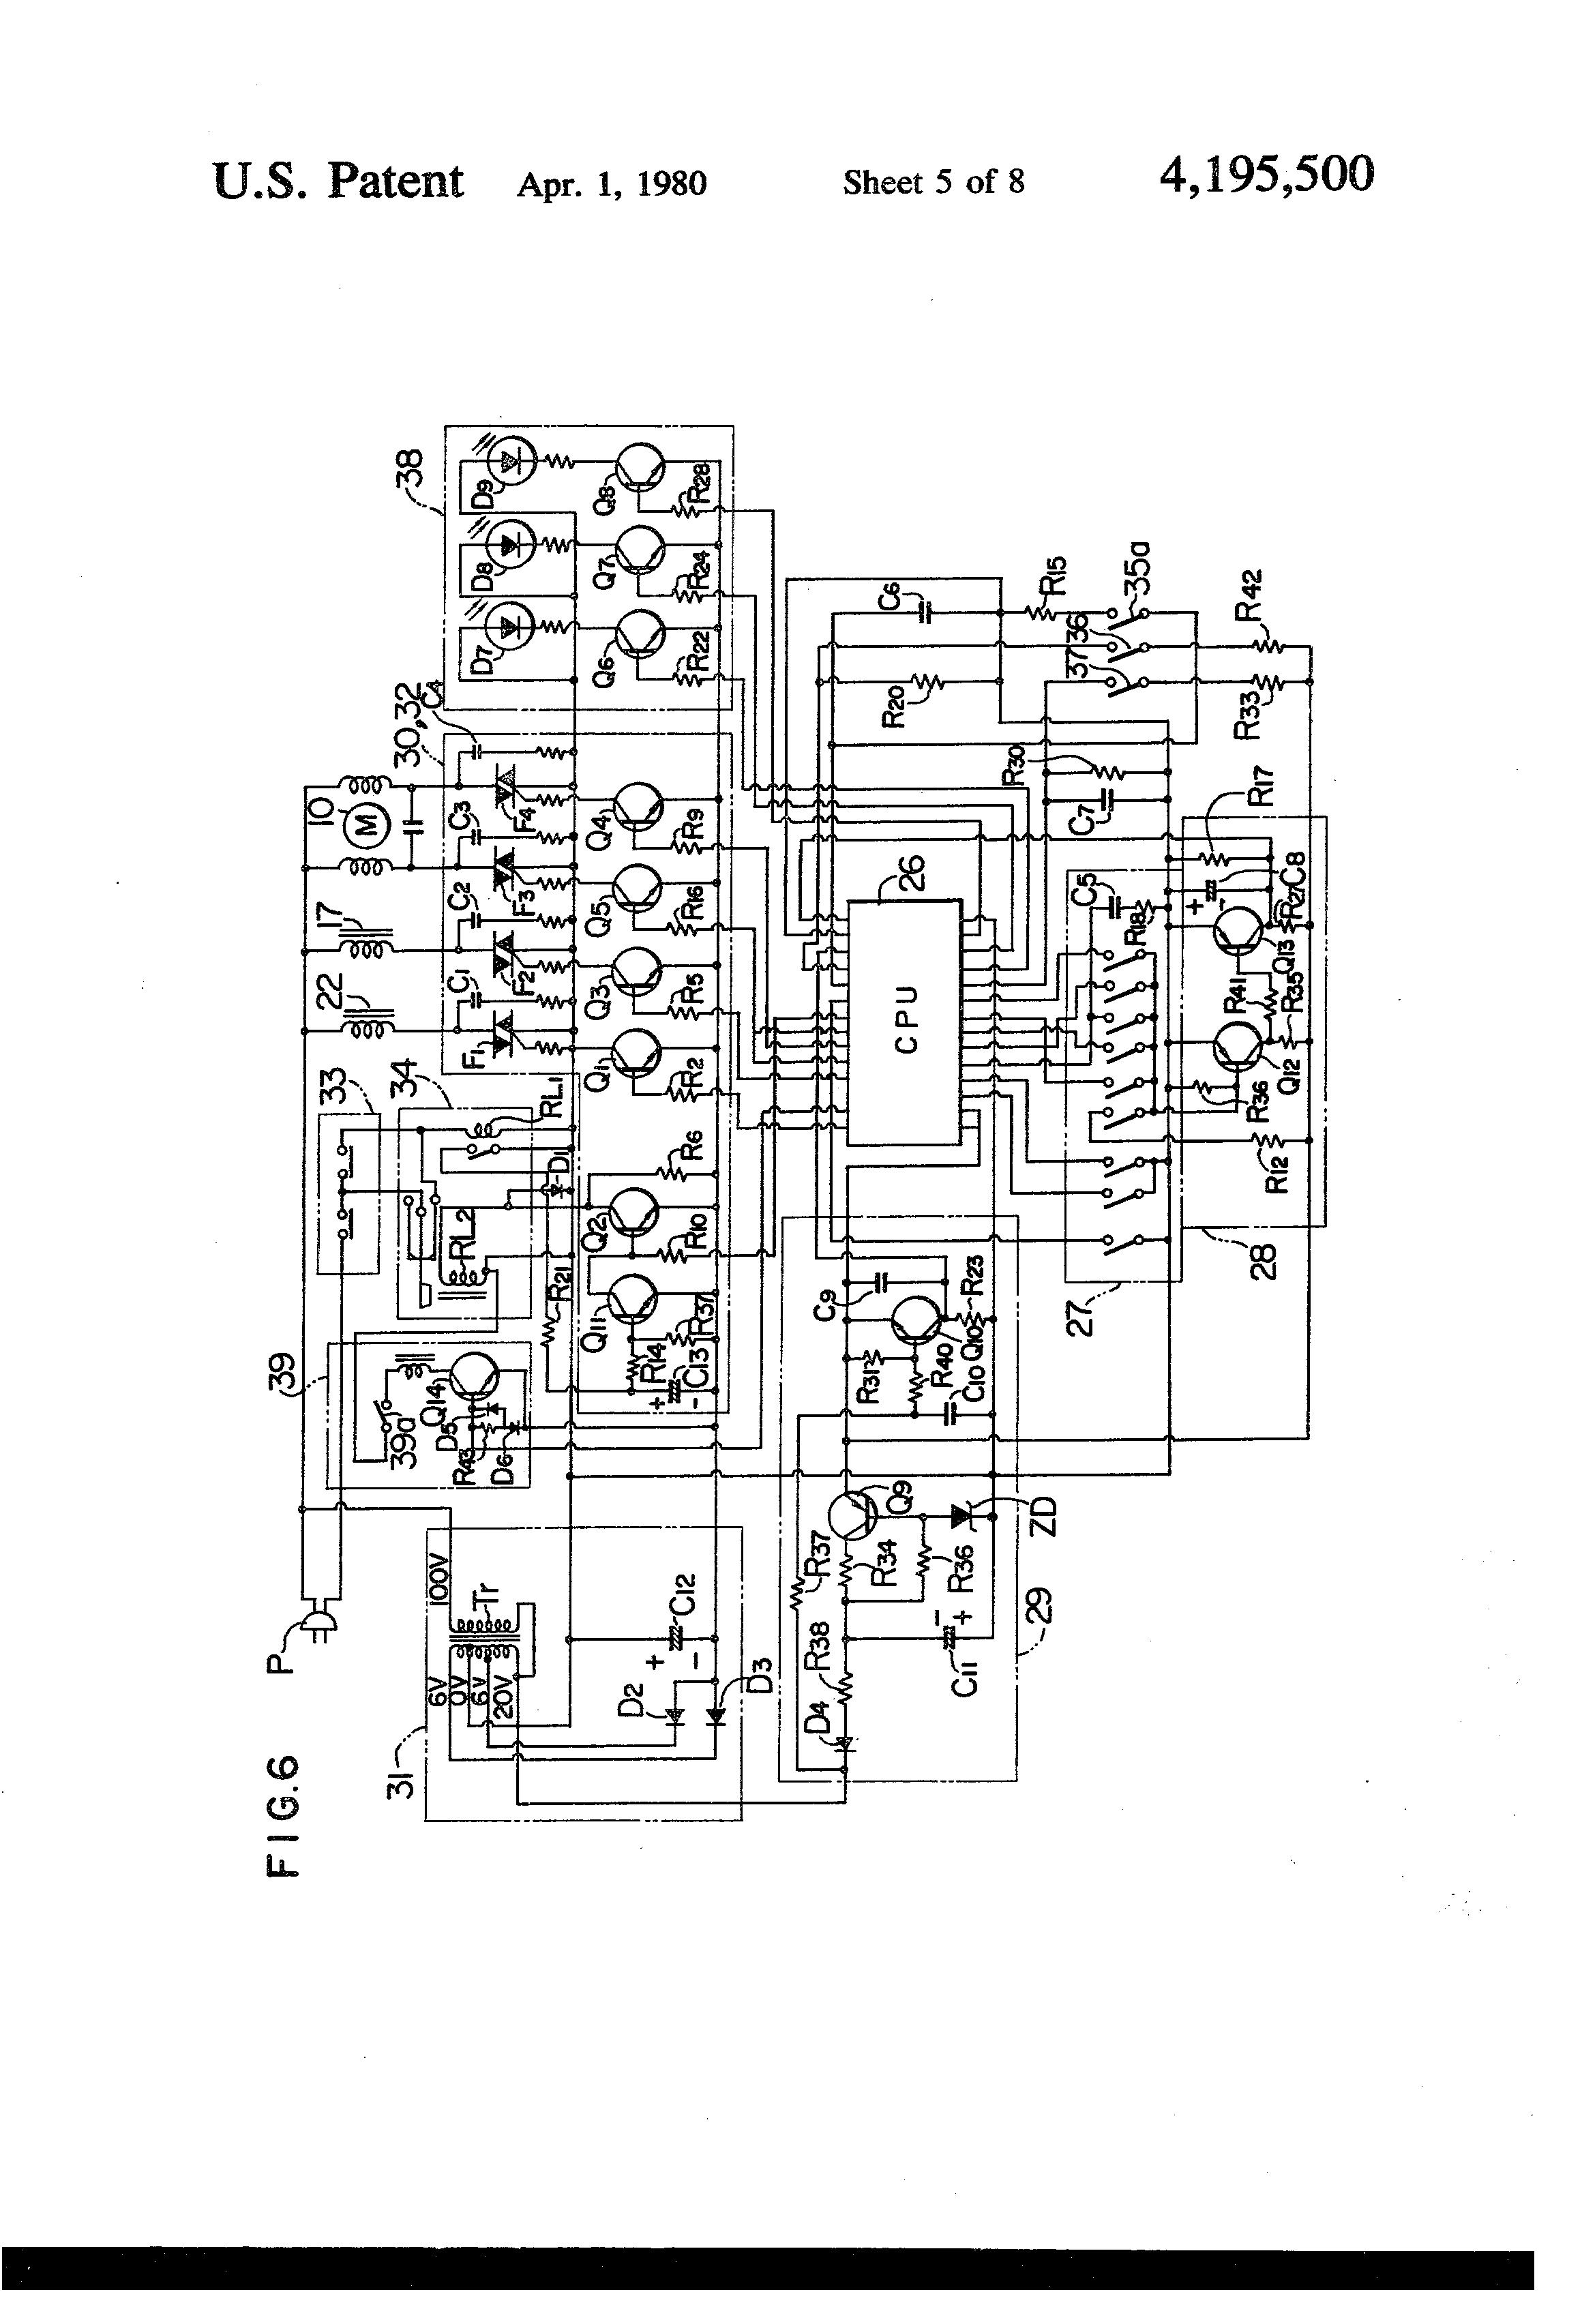 Hoover Front Loader Washing Machine Manual Wiring Diagram